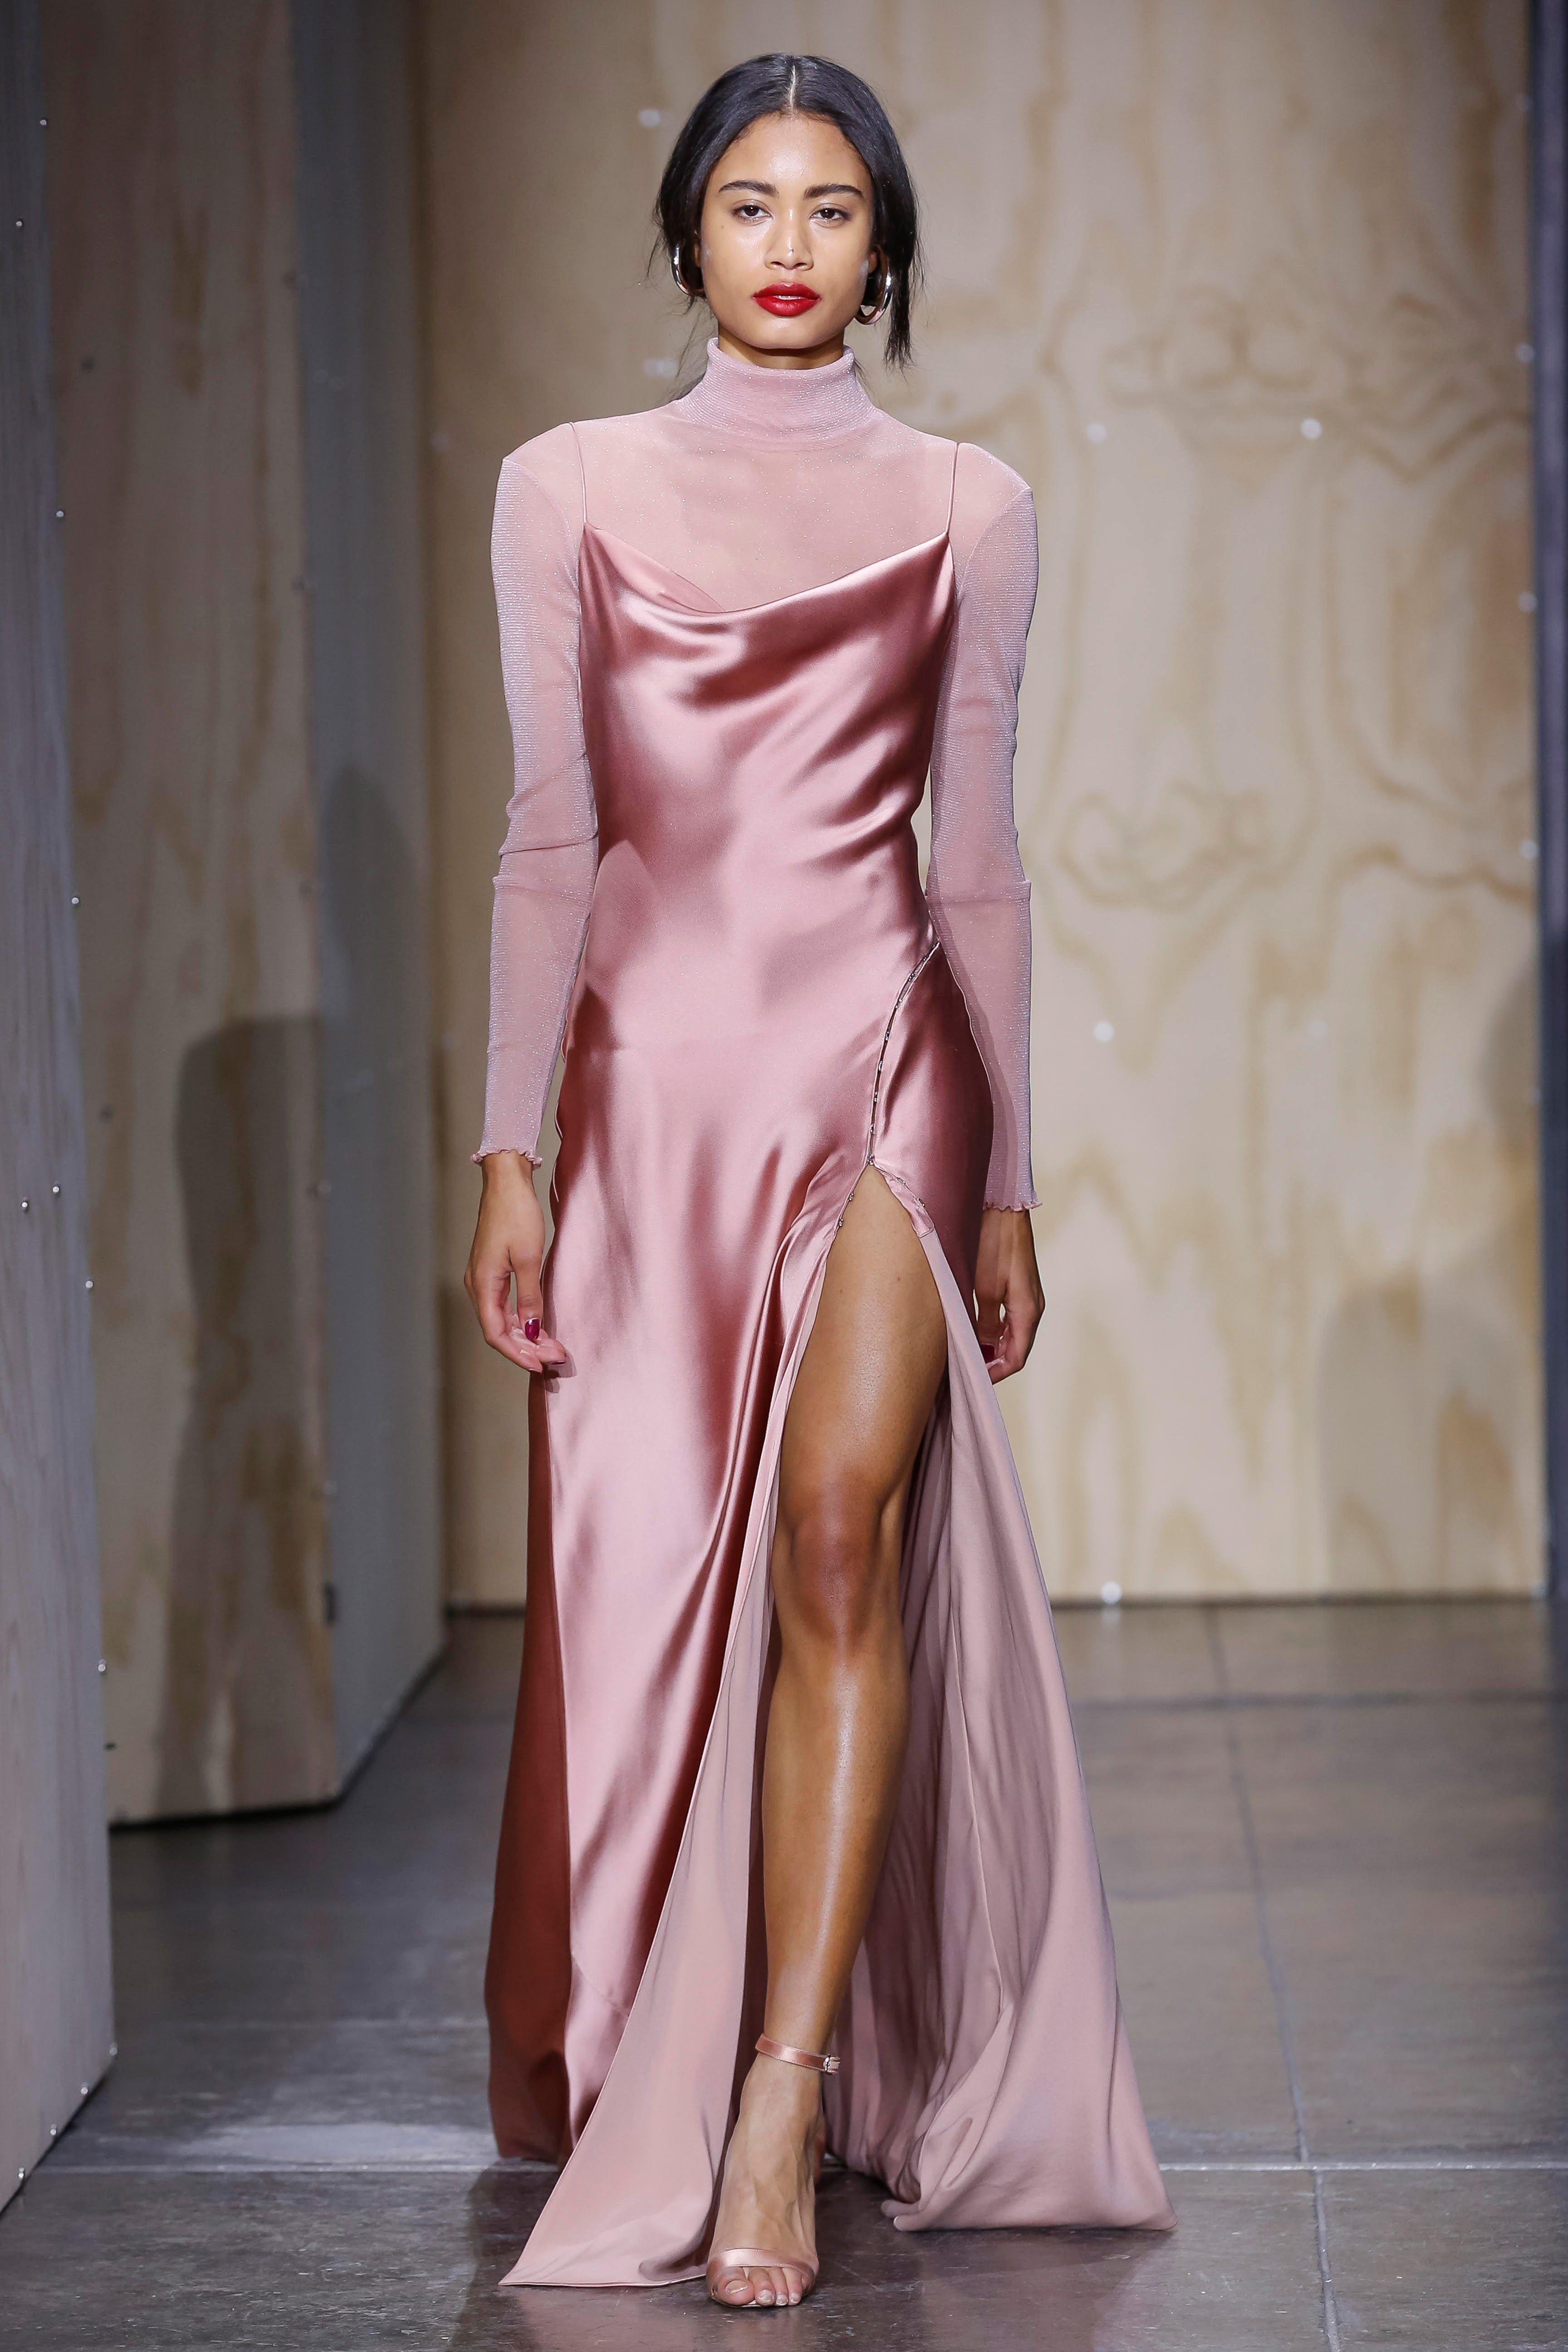 fb7169861b3 Jonathan Simkhai Fall 2019 Ready-to-Wear Fashion Show in 2019 ...